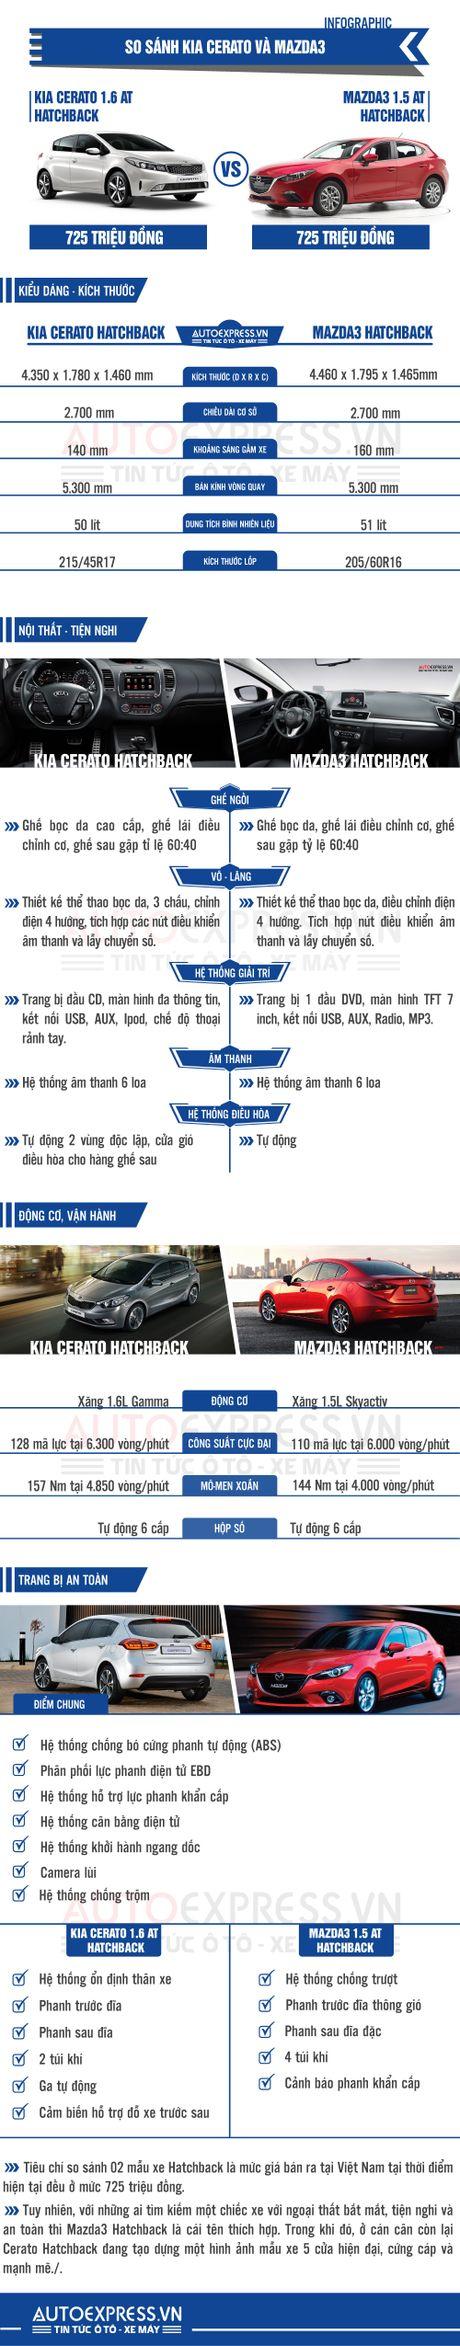 Chon xe Hatchback, lay Mazda 3 hay Kia Cerato khi cung gia ban? - Anh 1